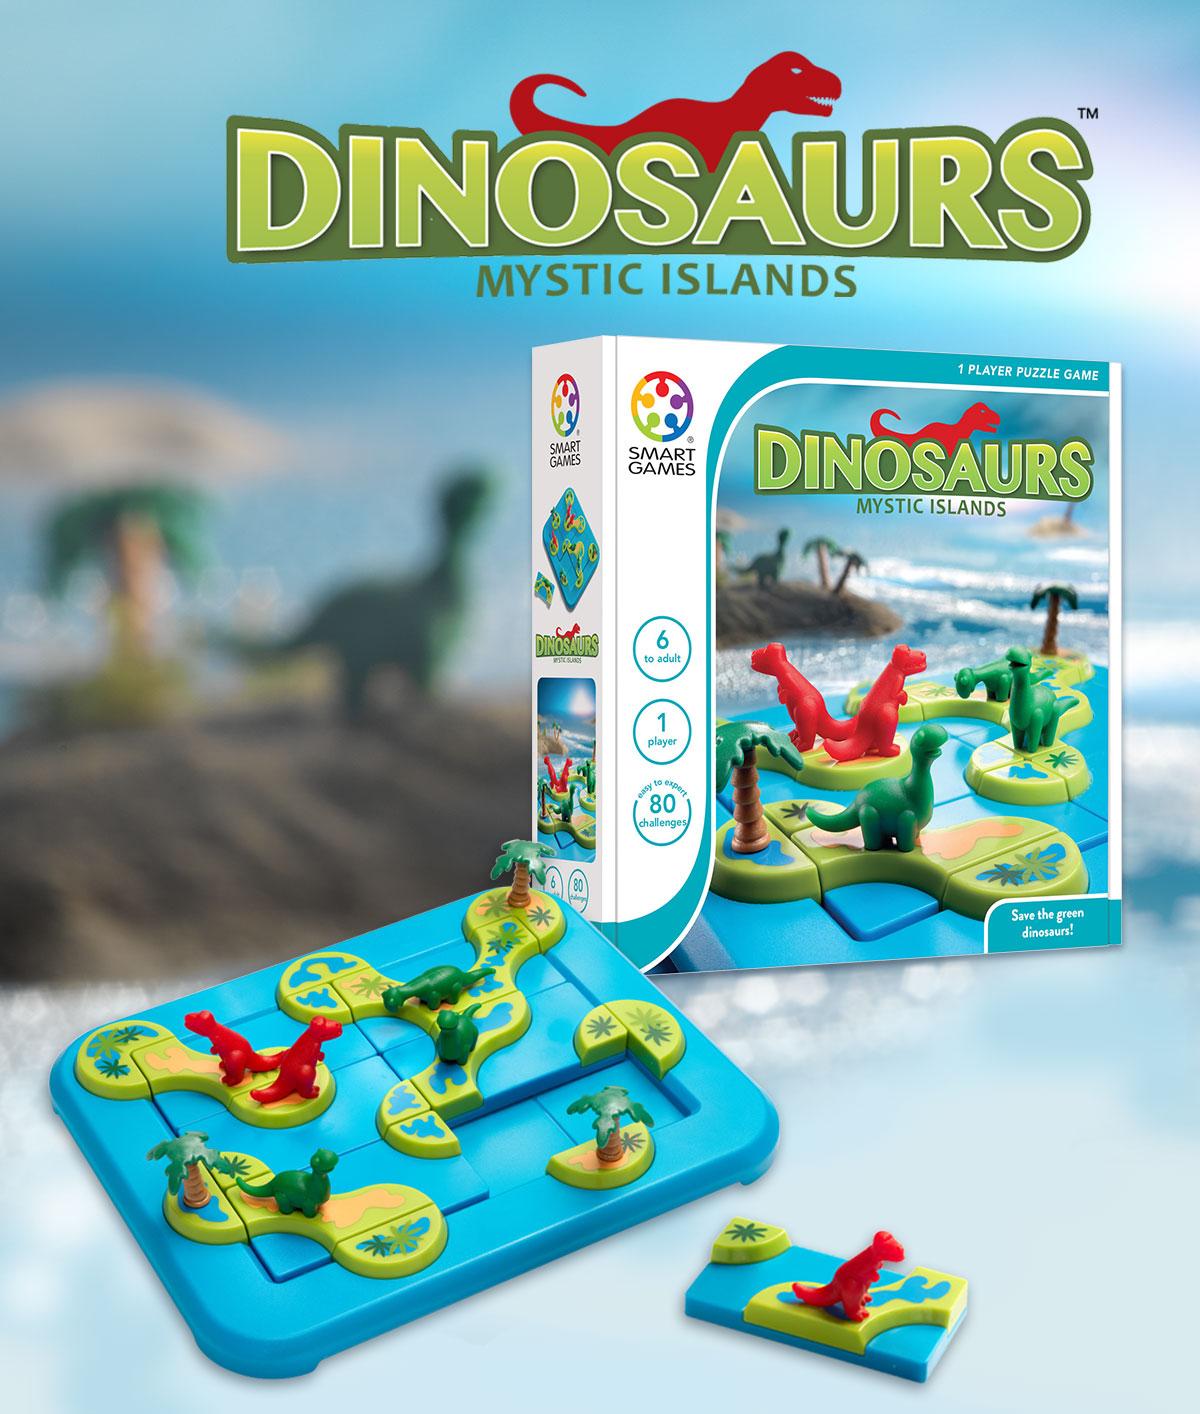 Dinosaurs - Mystic Islands